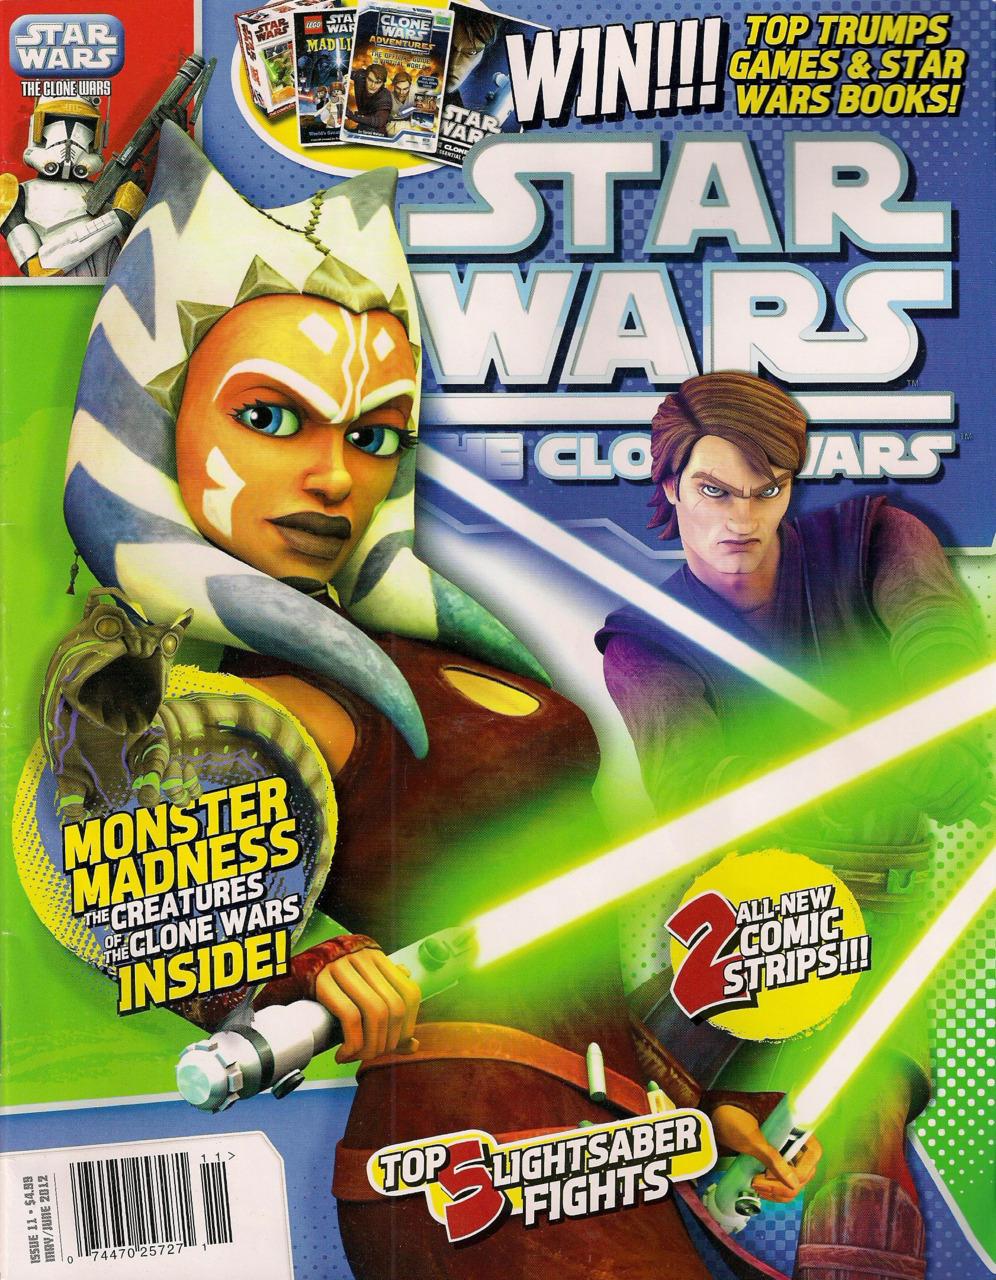 Star Wars The Clone Wars Magazine 11